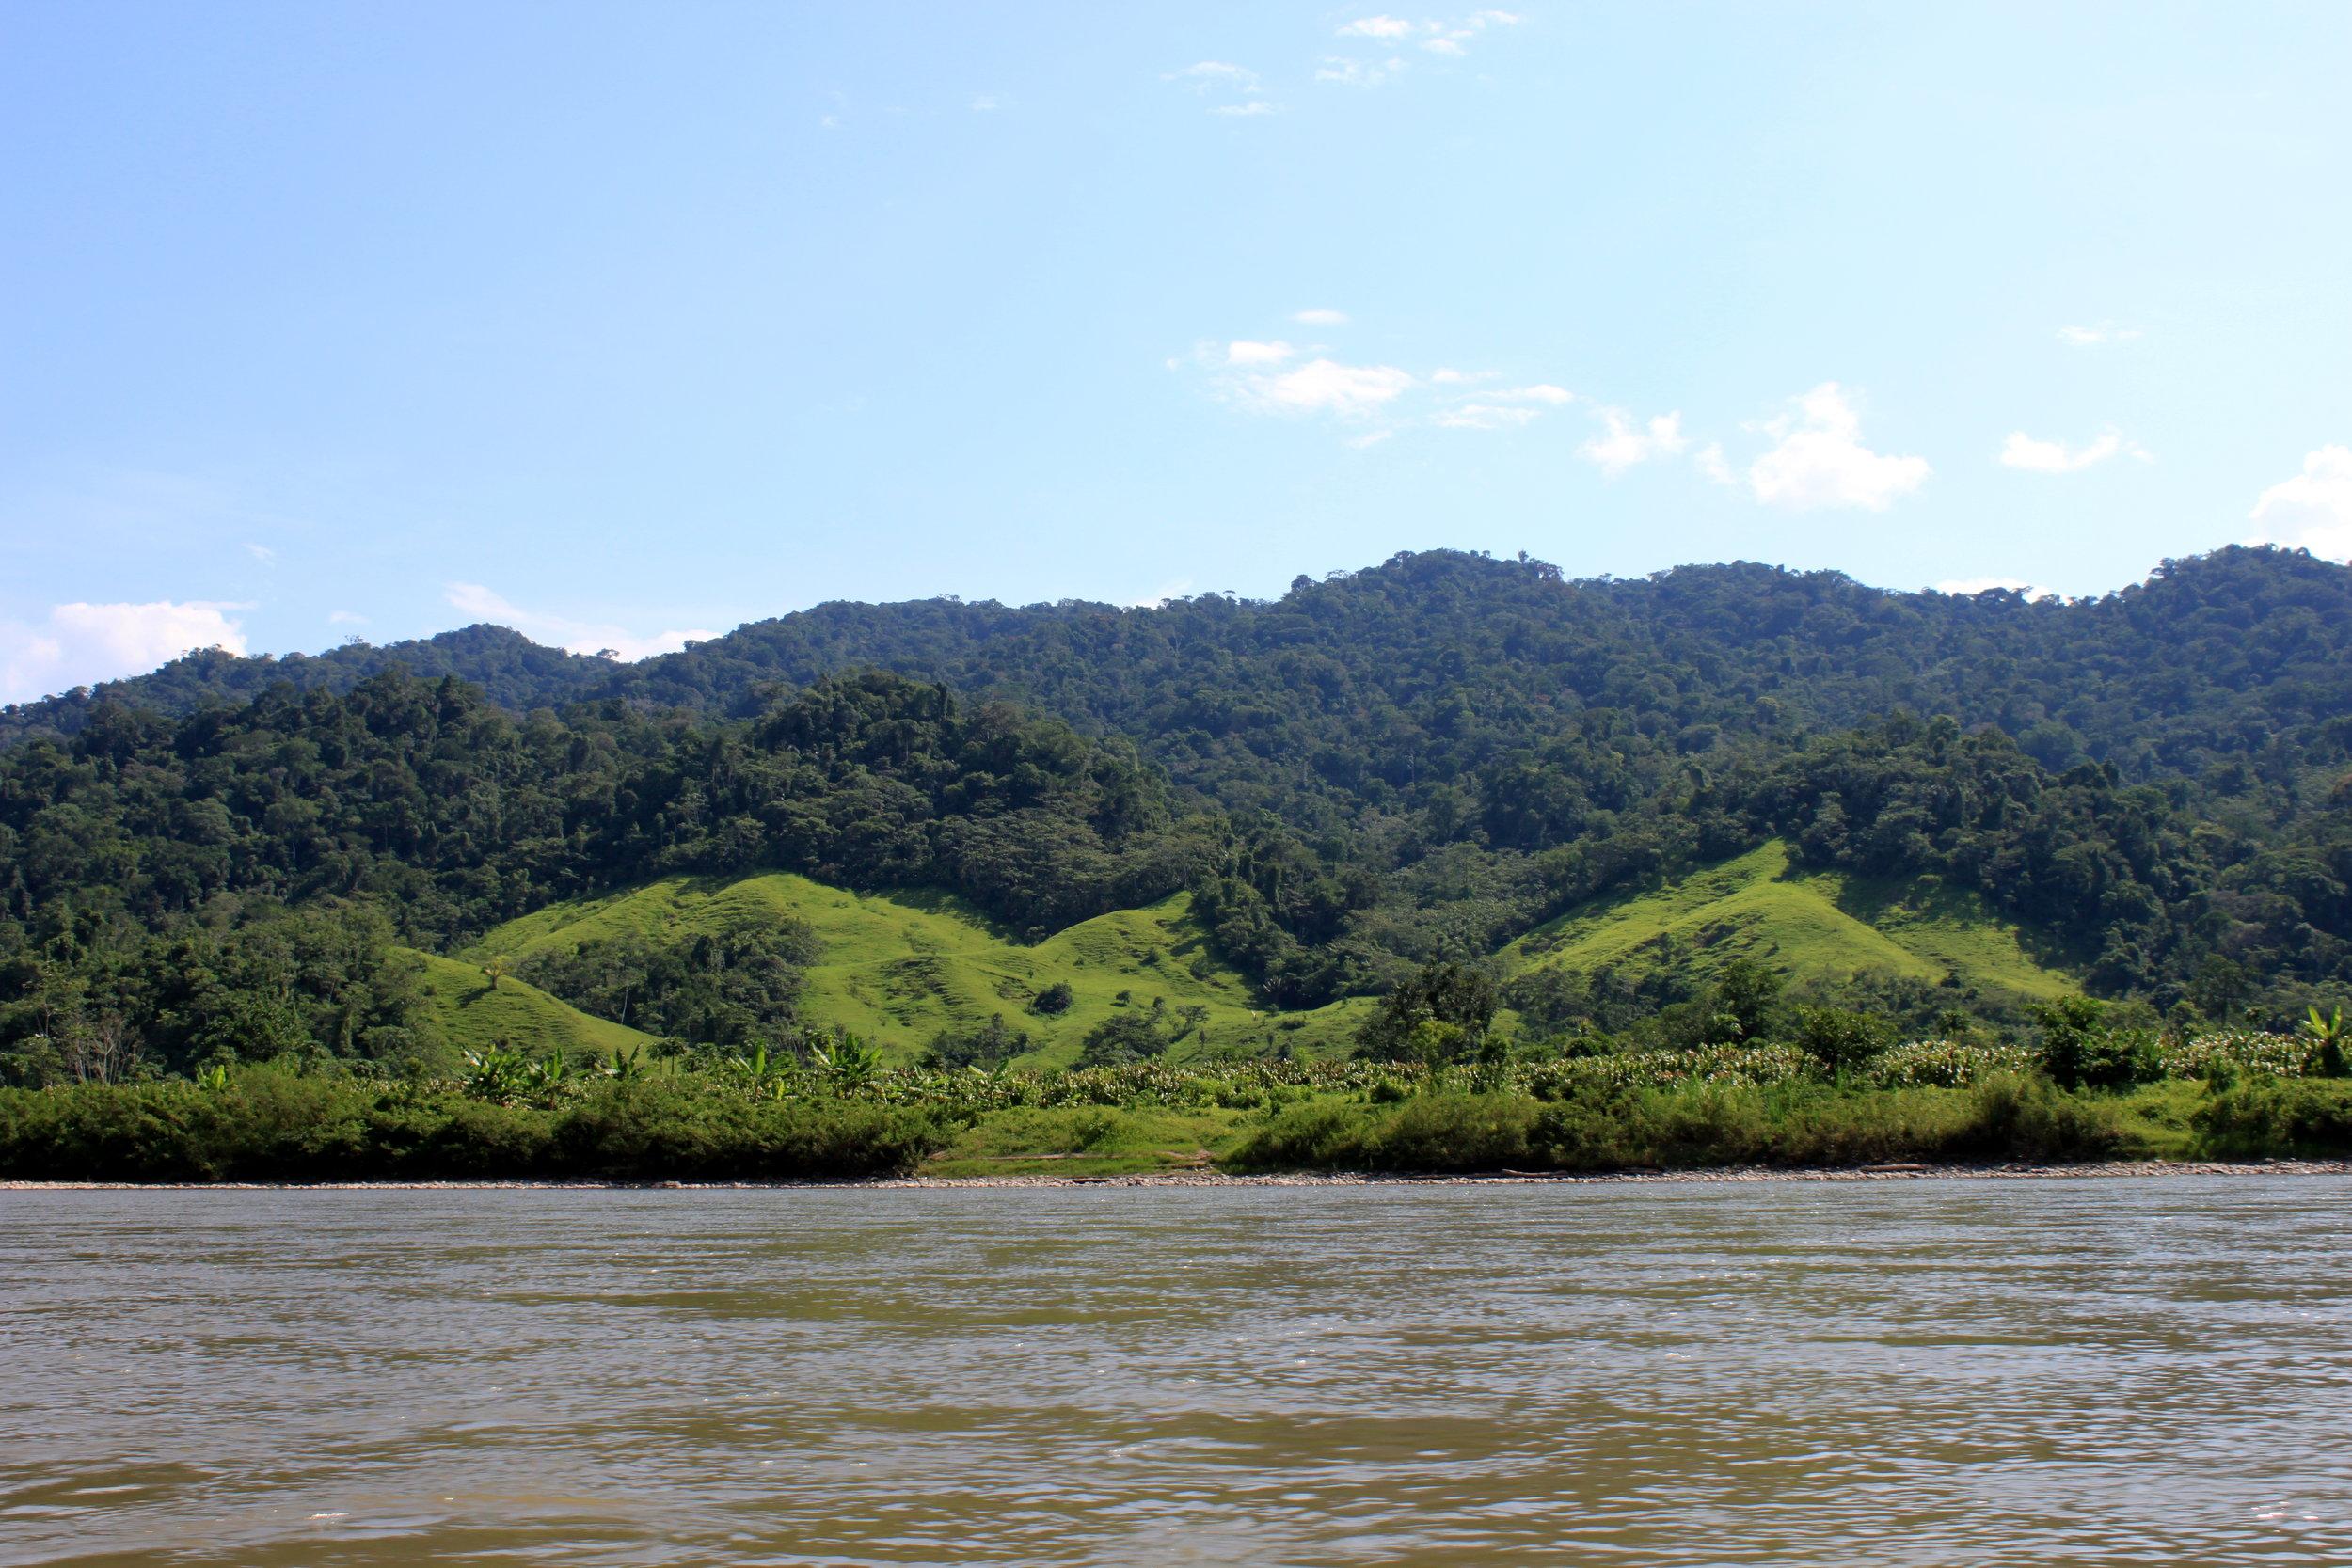 Co+op_Forest_image_river.JPG